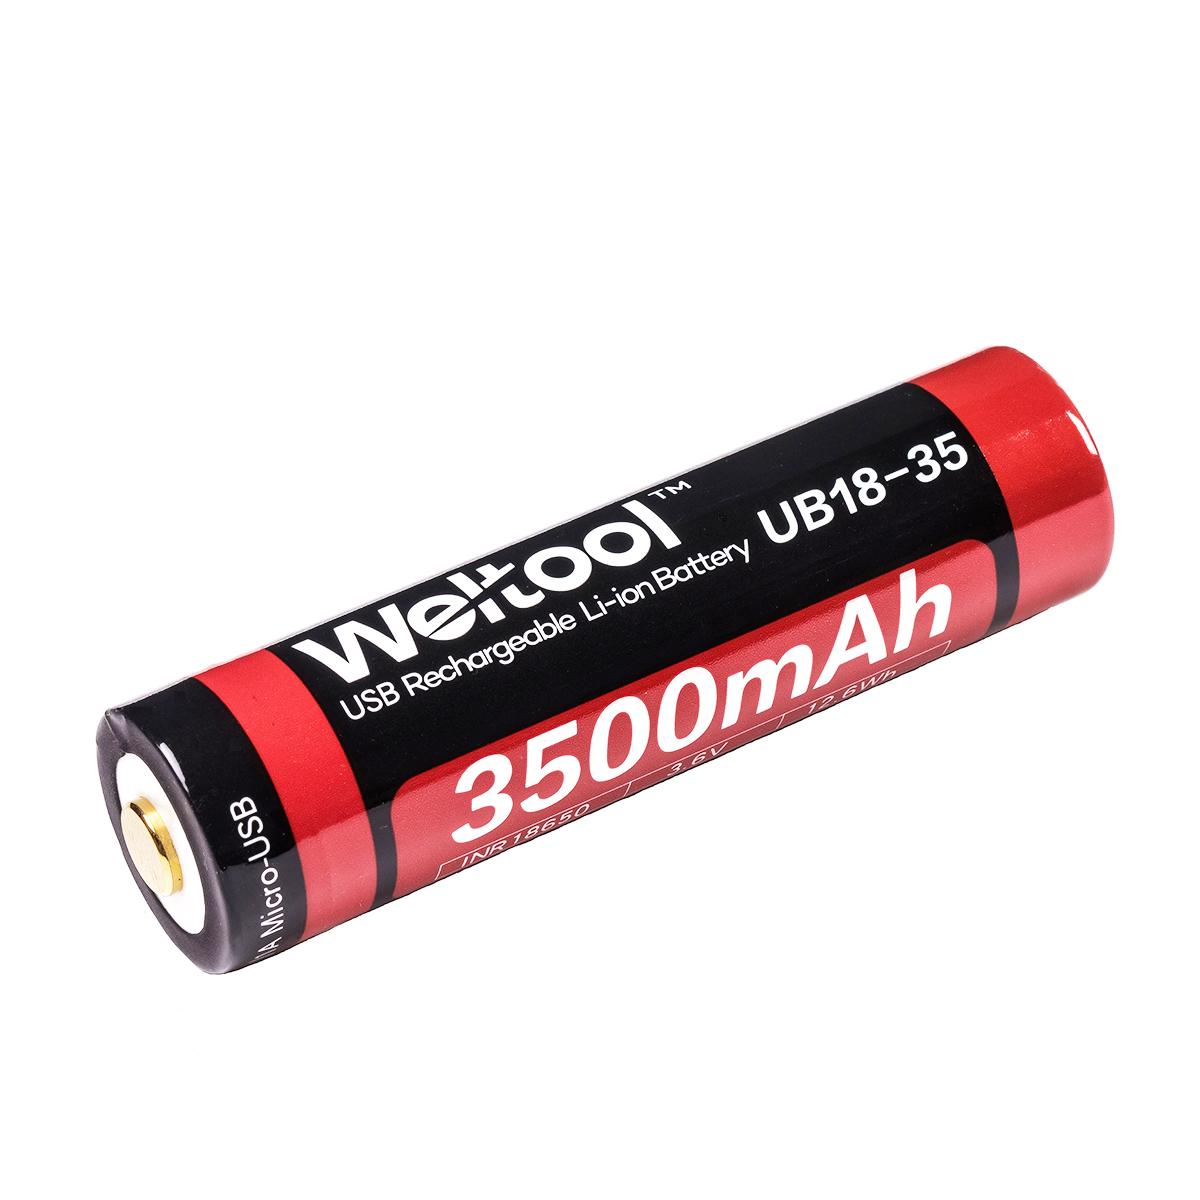 Weltool UB18-35 18650 3500mAh USB Rechargeable Li-ion Battery